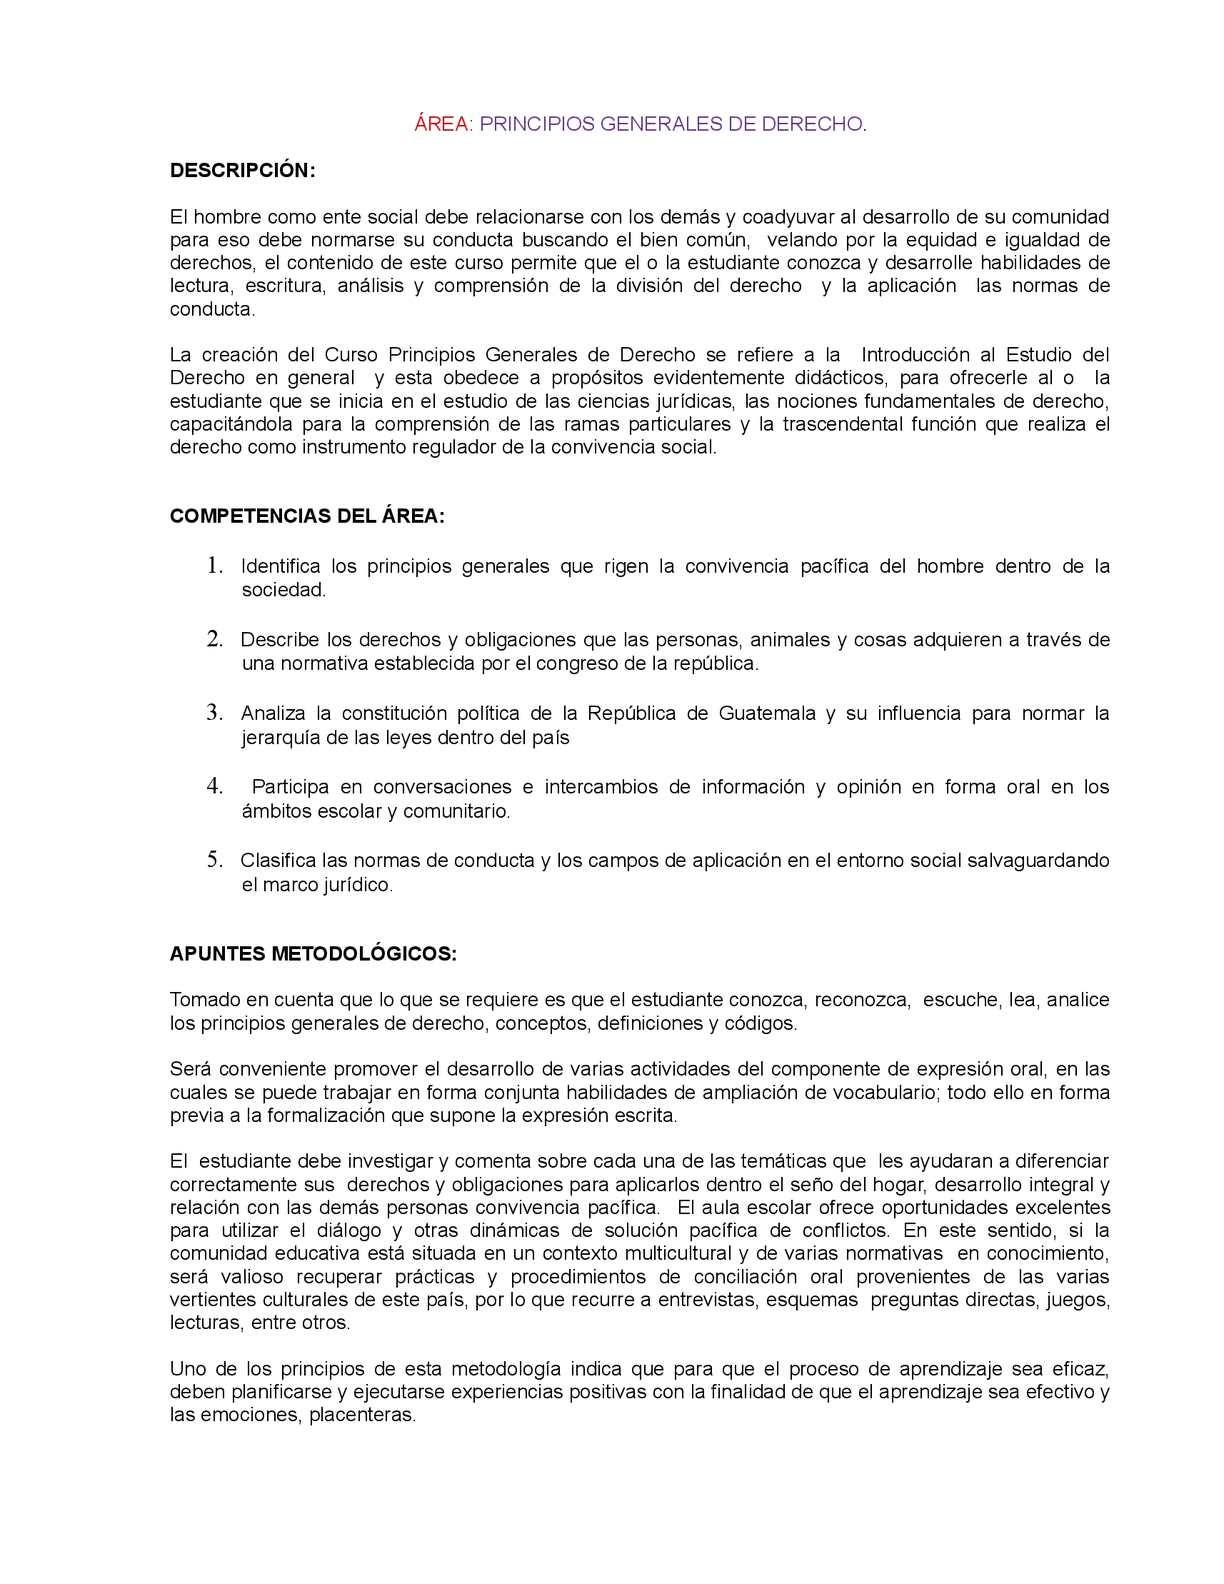 Calaméo - Malla Curricular Principios Generales De Derecho